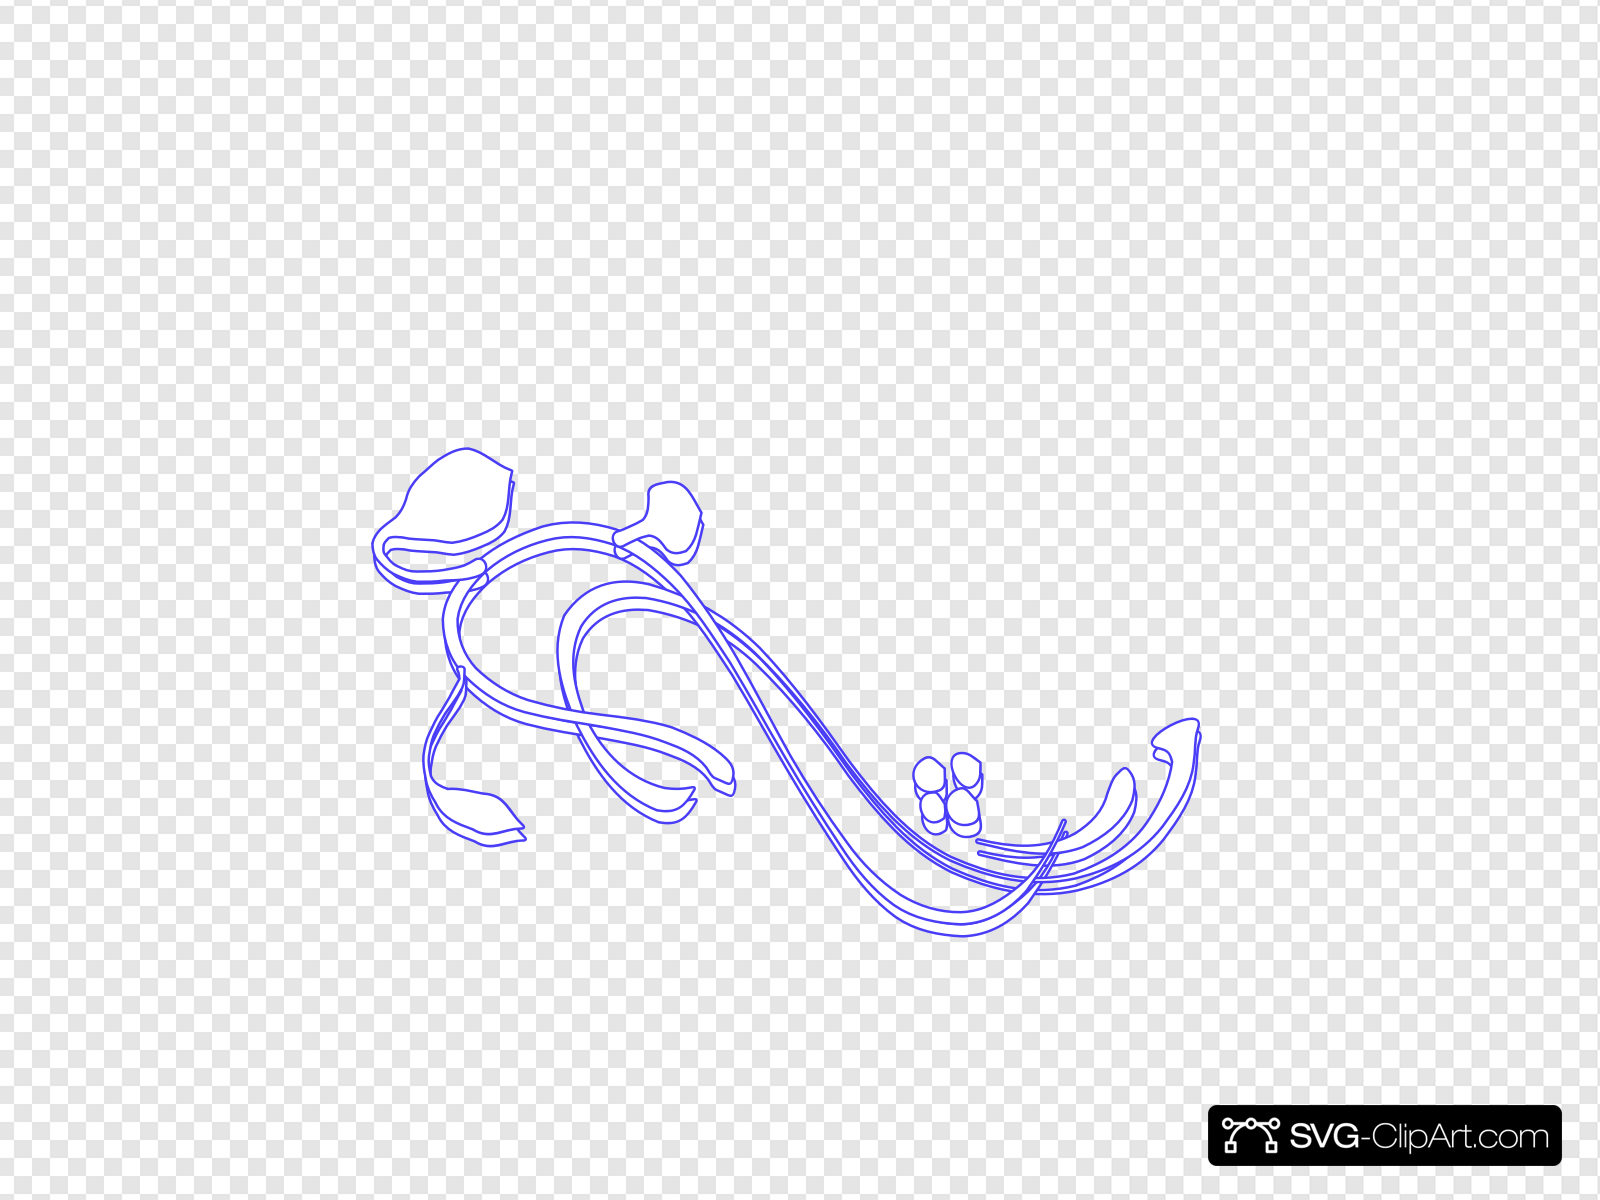 White Flourish W Blue Outline Clip art, Icon and SVG.